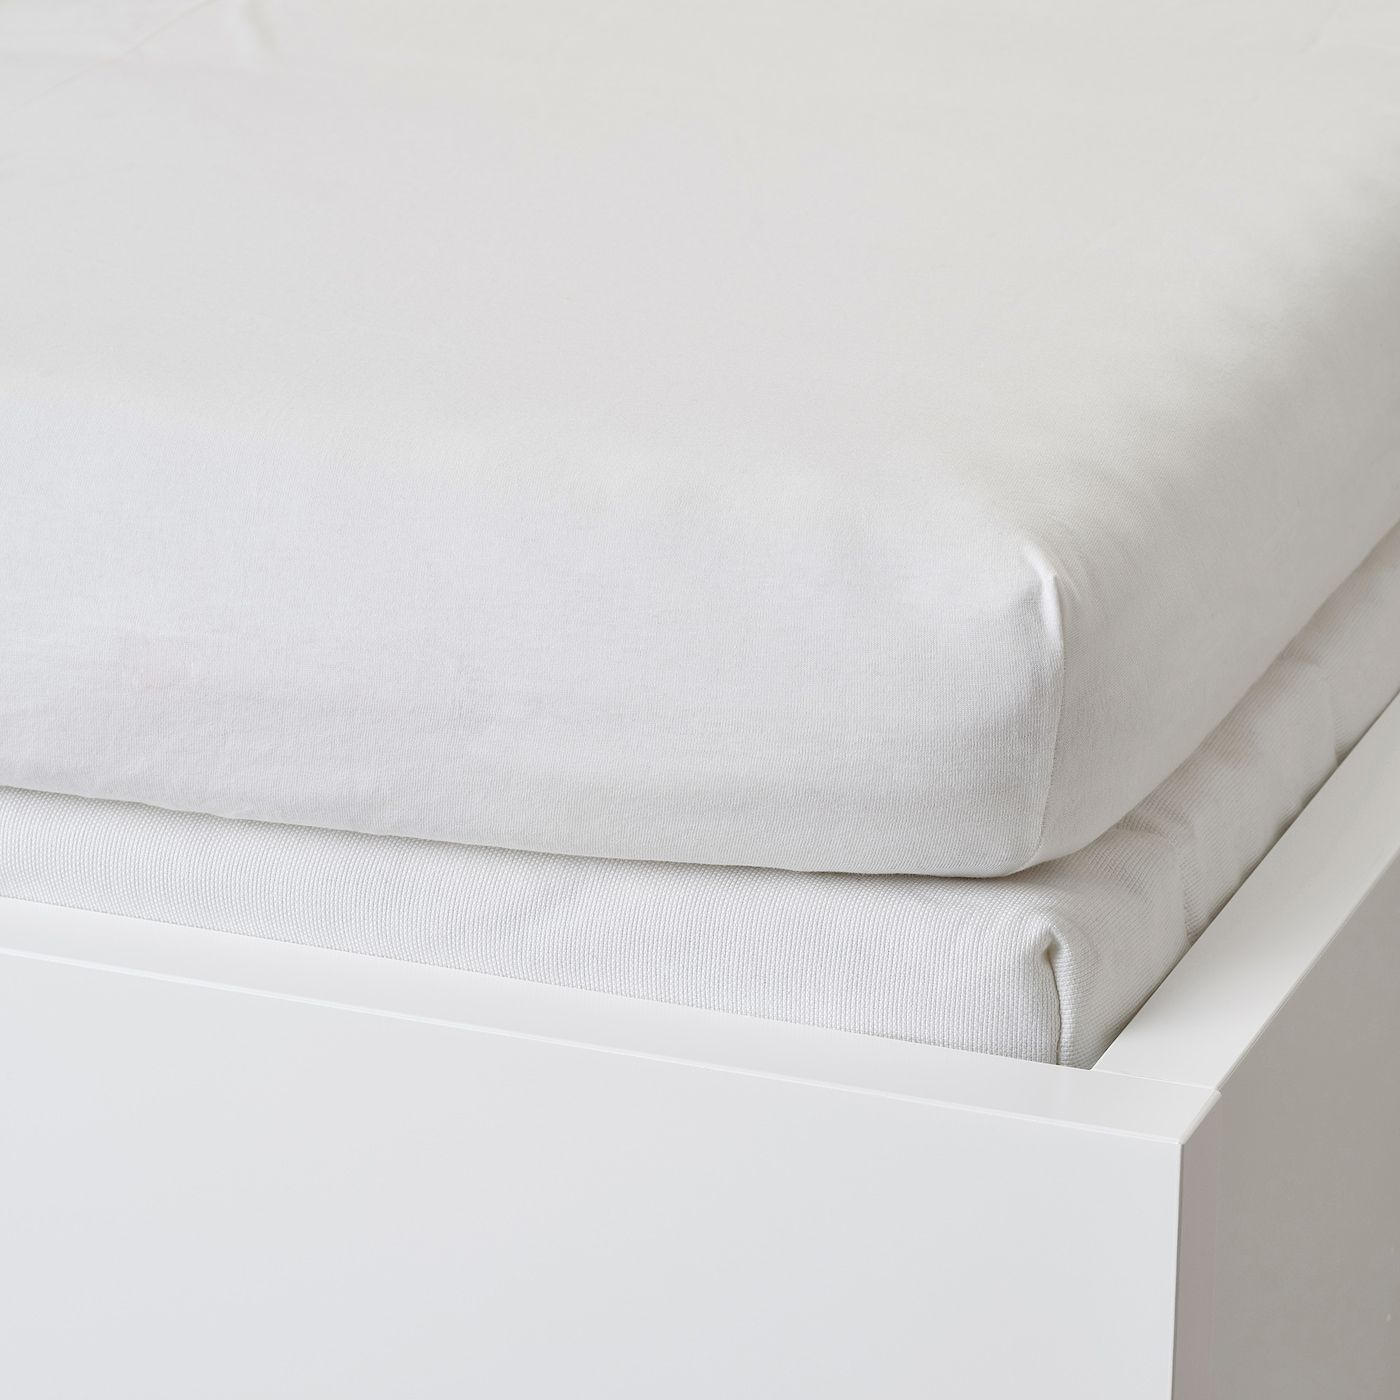 Varvial Spannbettlaken Fur Tagesbett Weiss Ikea Osterreich In 2020 Fitted Sheet Ikea Mattress